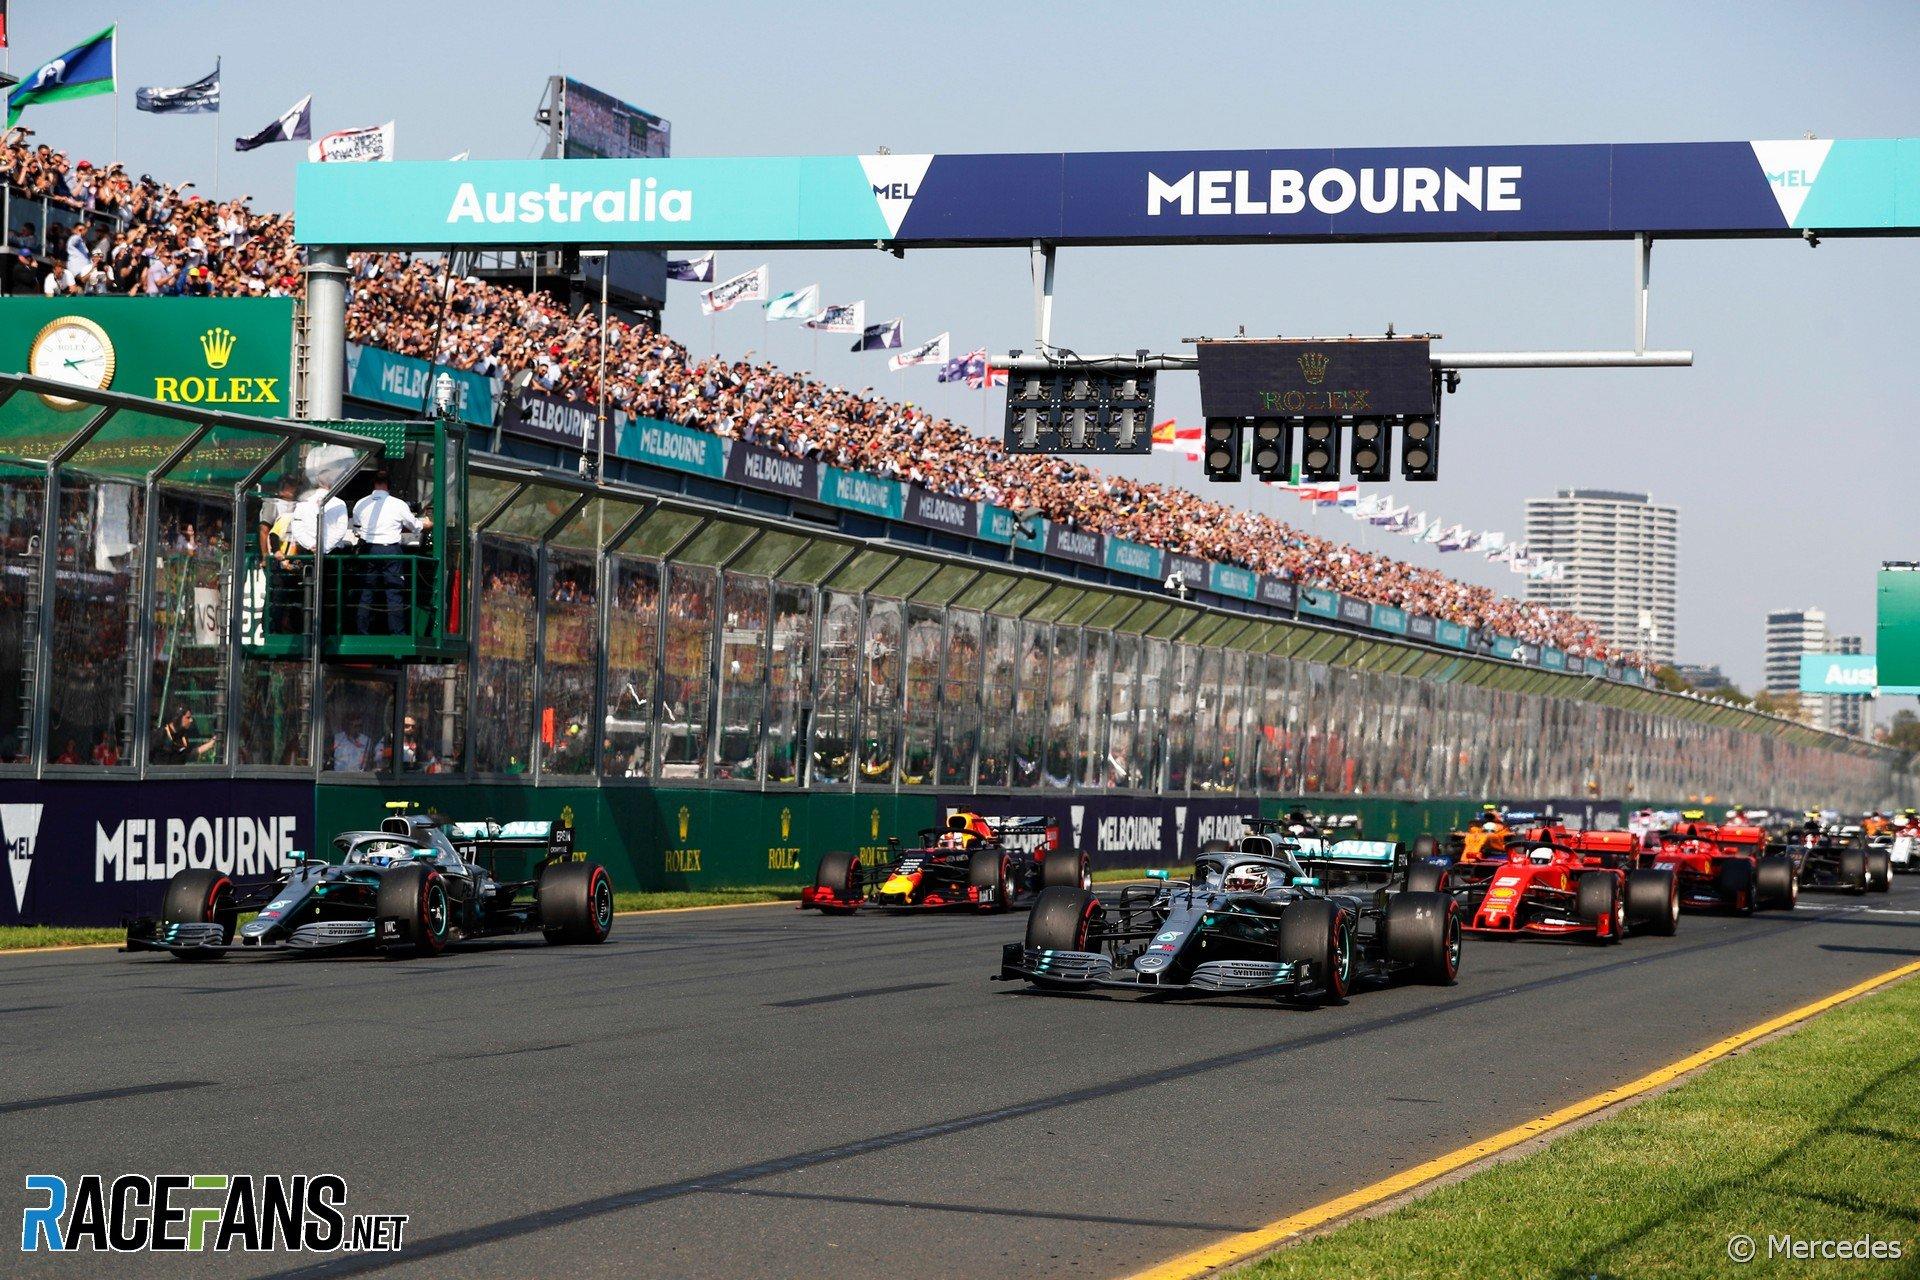 2019 F1 Calendar: Formula One Race Schedule - Racefans F1 Calendar 2019 Channel 4